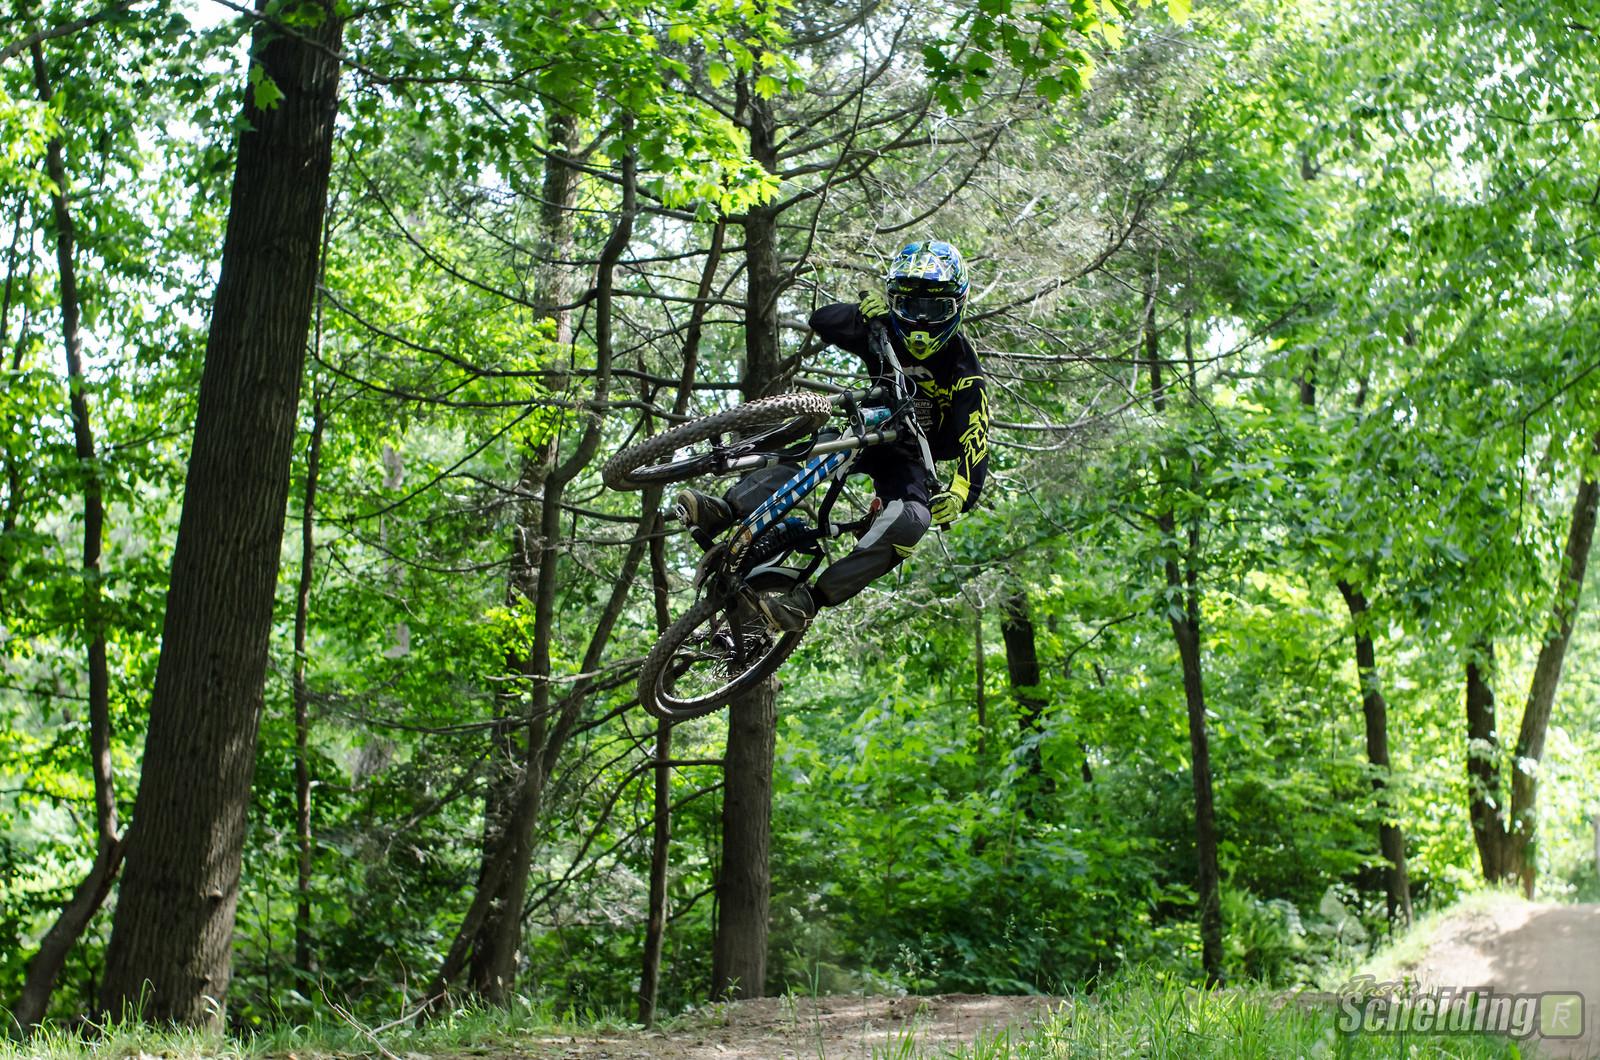 DSC 9265 - JasonScheiding - Mountain Biking Pictures - Vital MTB